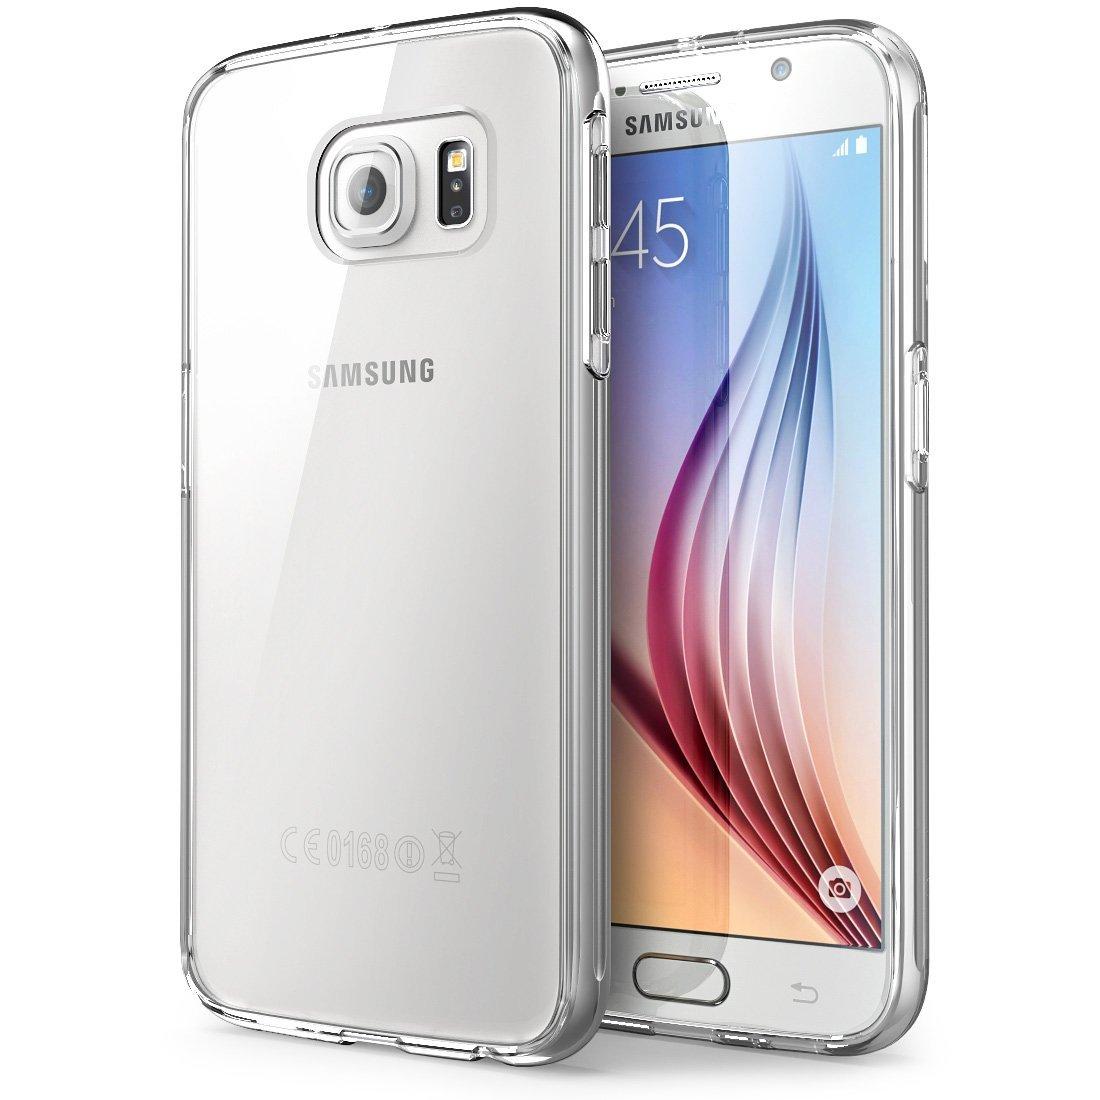 Silikonový obal / kryt Goospery Mercury pro Samsung Galaxy S6 (čirý)